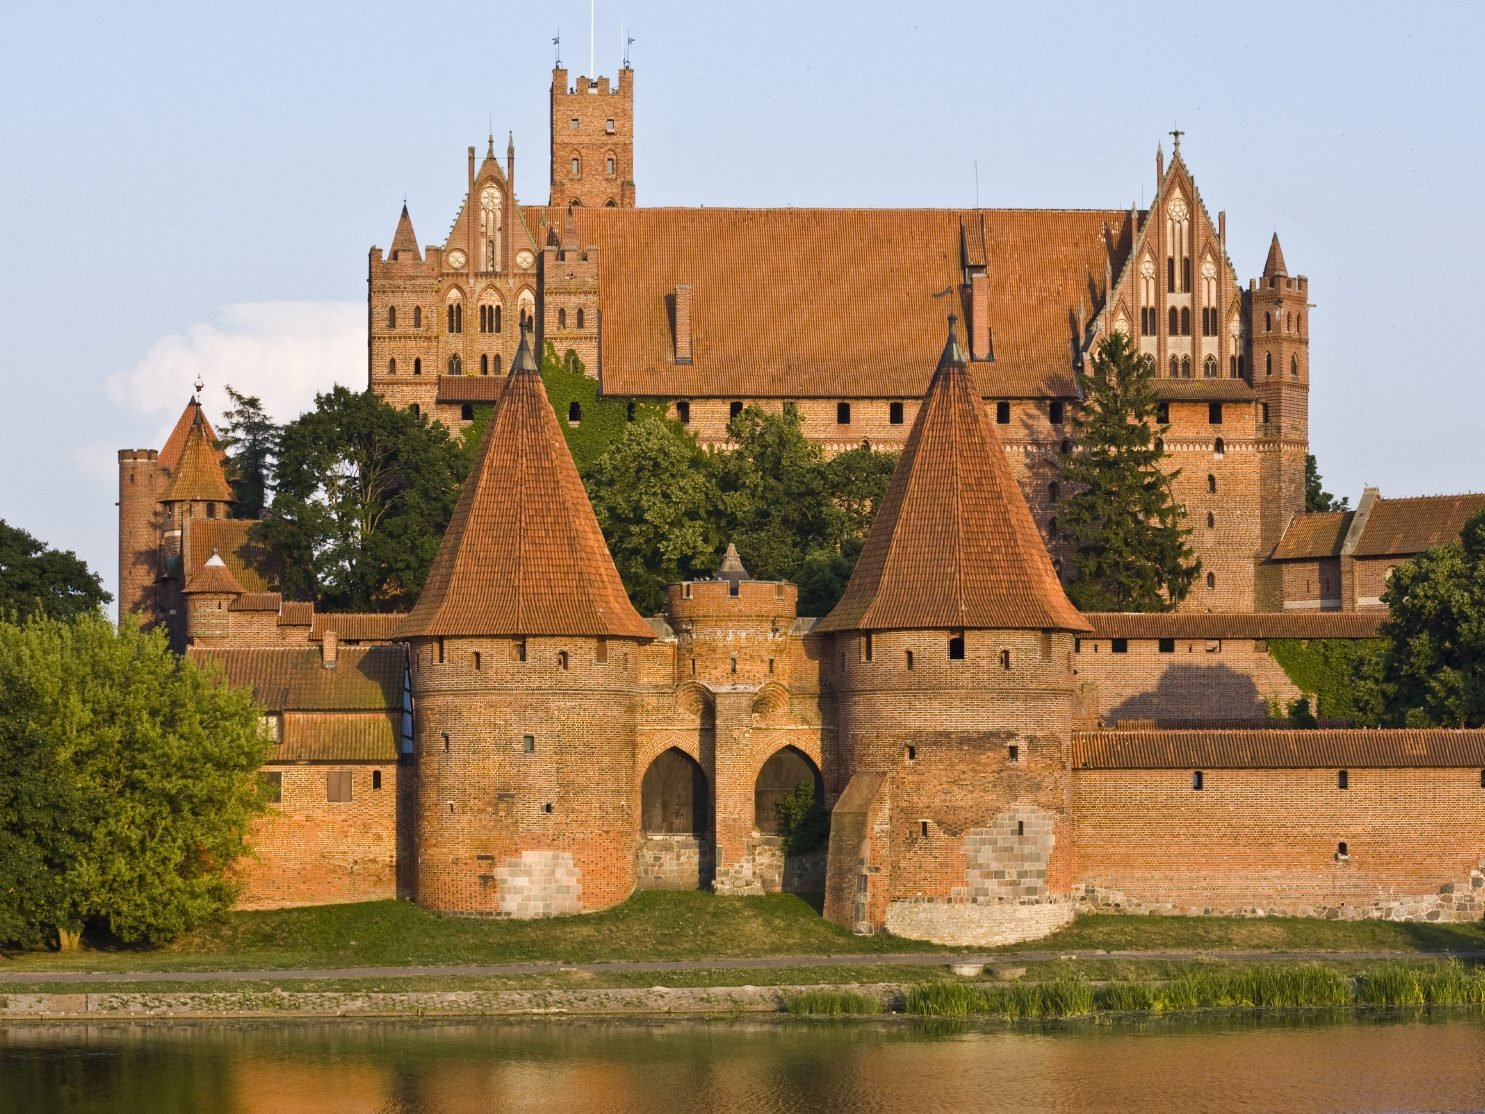 Pologne - Malbork: la forteresse de Marienbourg